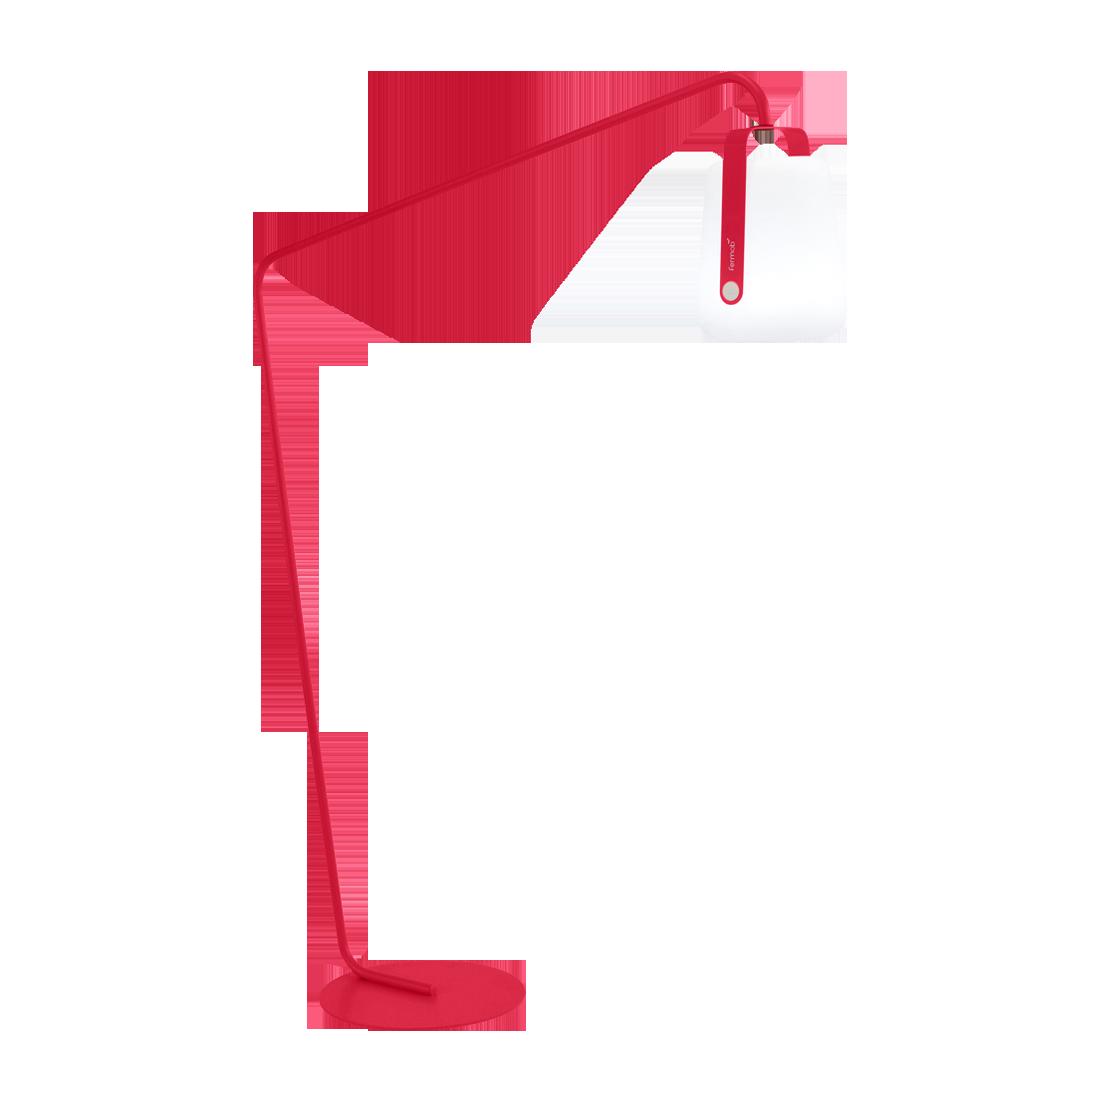 pied lampe balad, pied lampe fermob, grand pied lampe fermob, pied déporté lampe balad, pied lampe balad rose